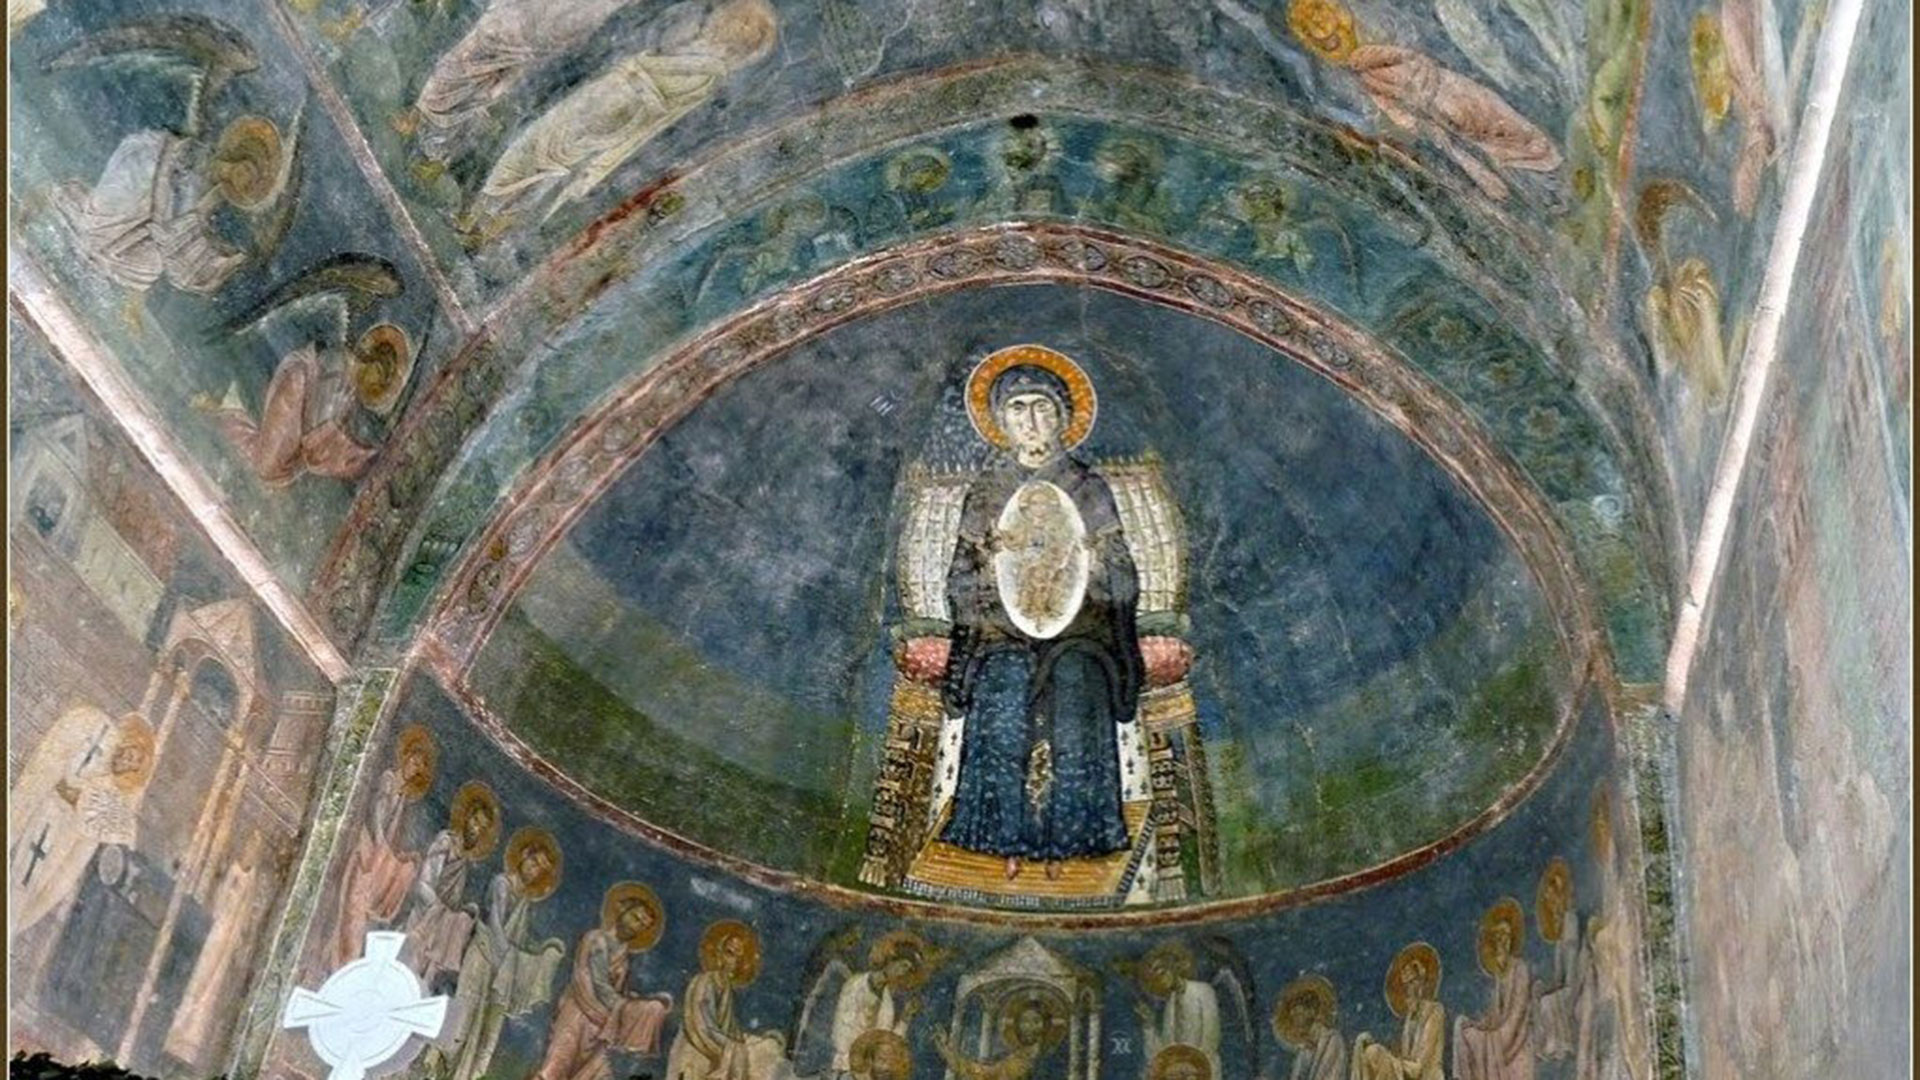 Church-St-Sophia-2-min